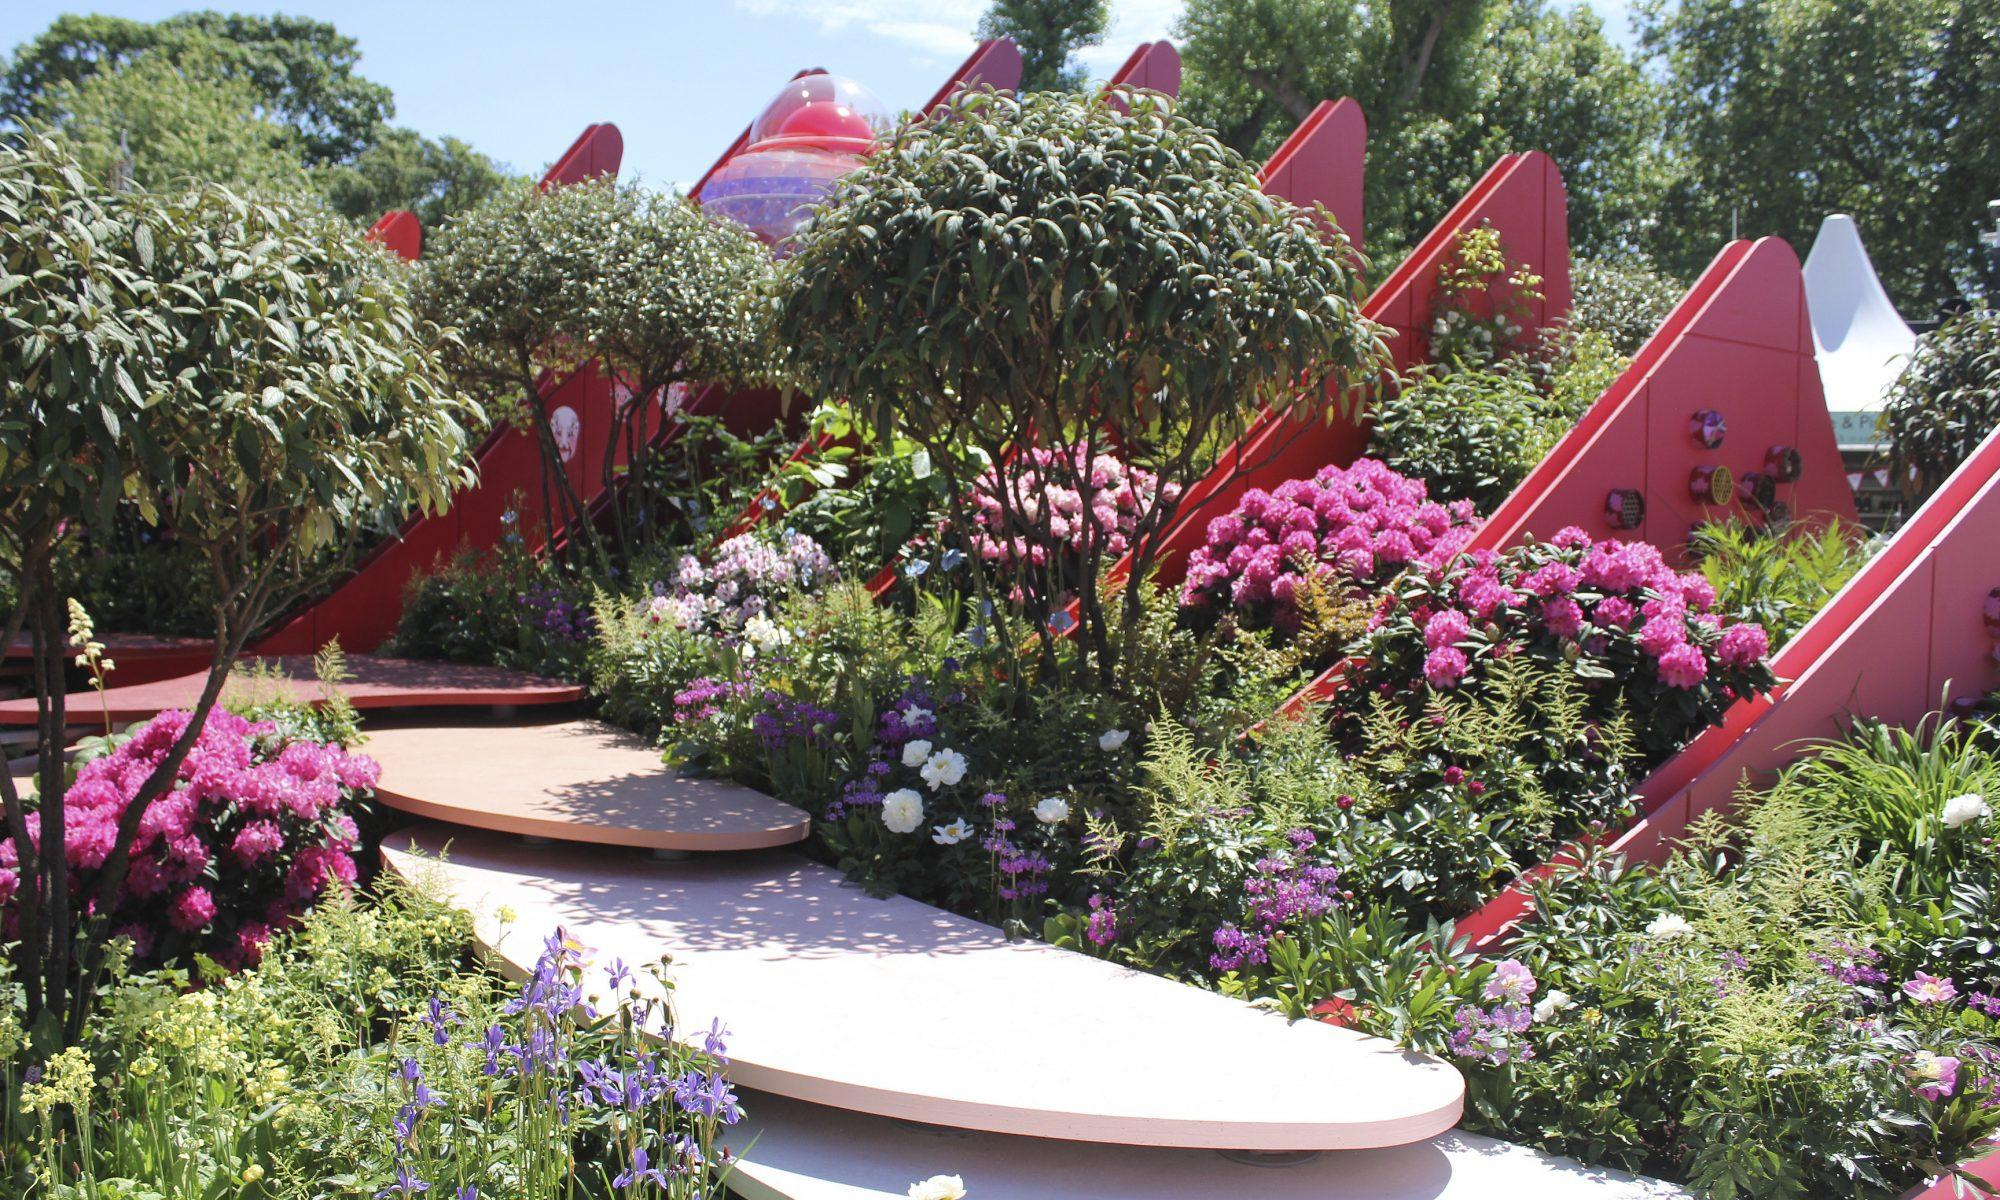 The-Silk-Road-garden-Chelsea-2017-2000x1200.jpg